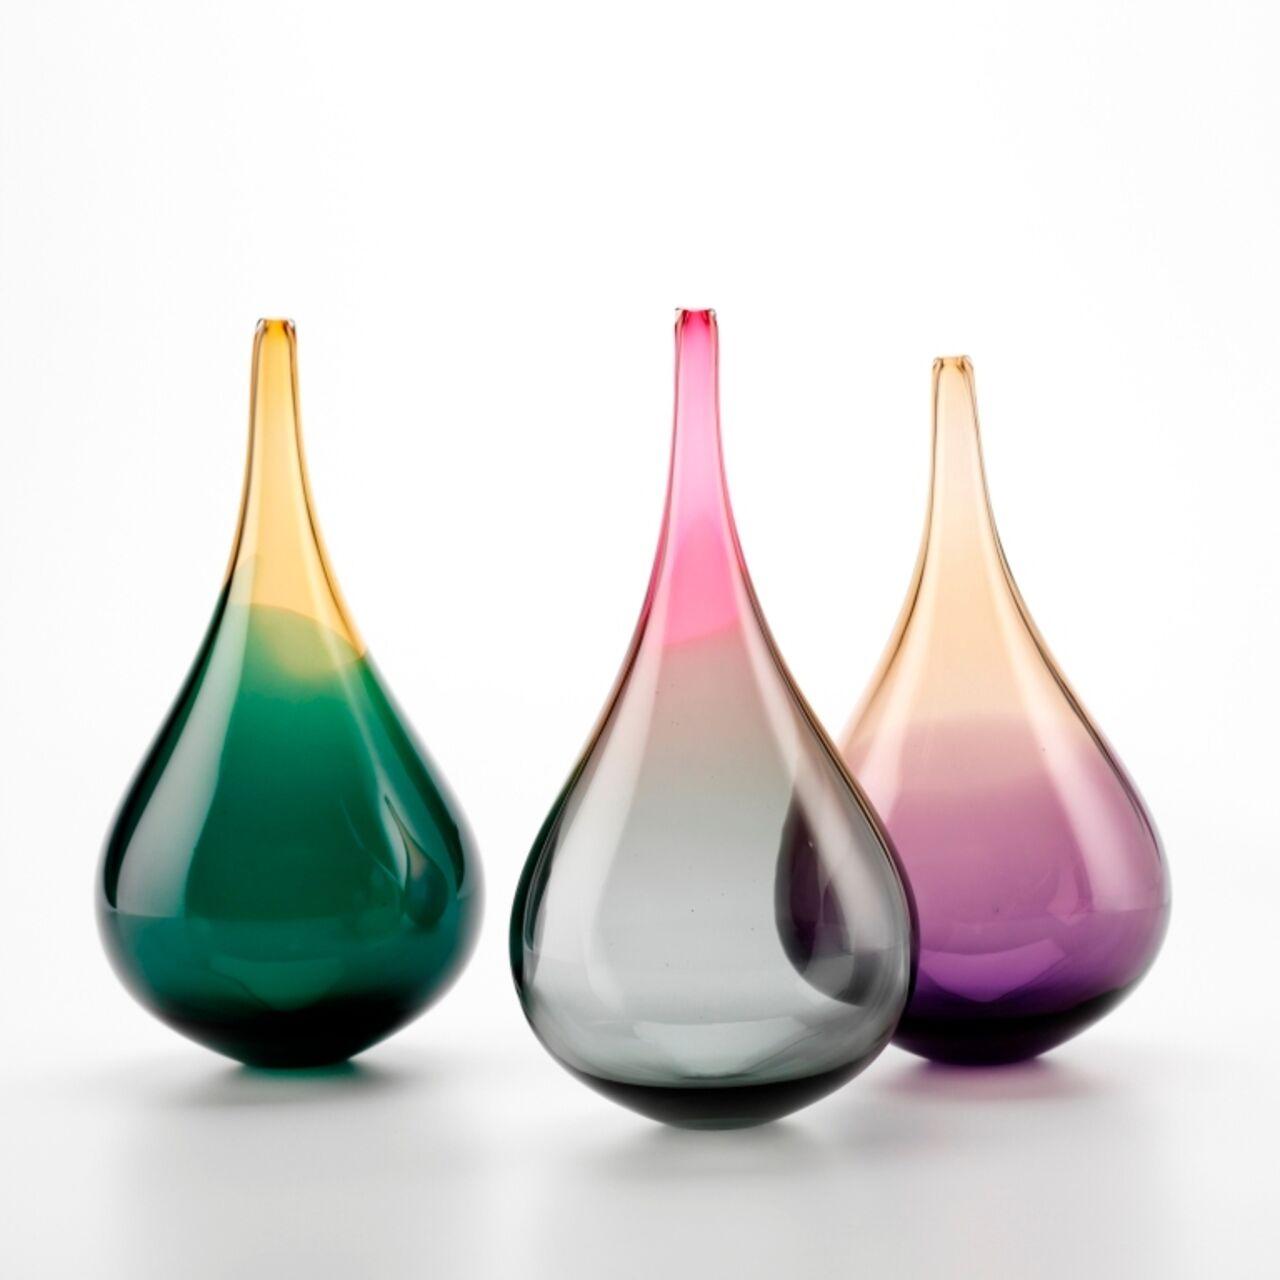 Elin Isaksson glassware